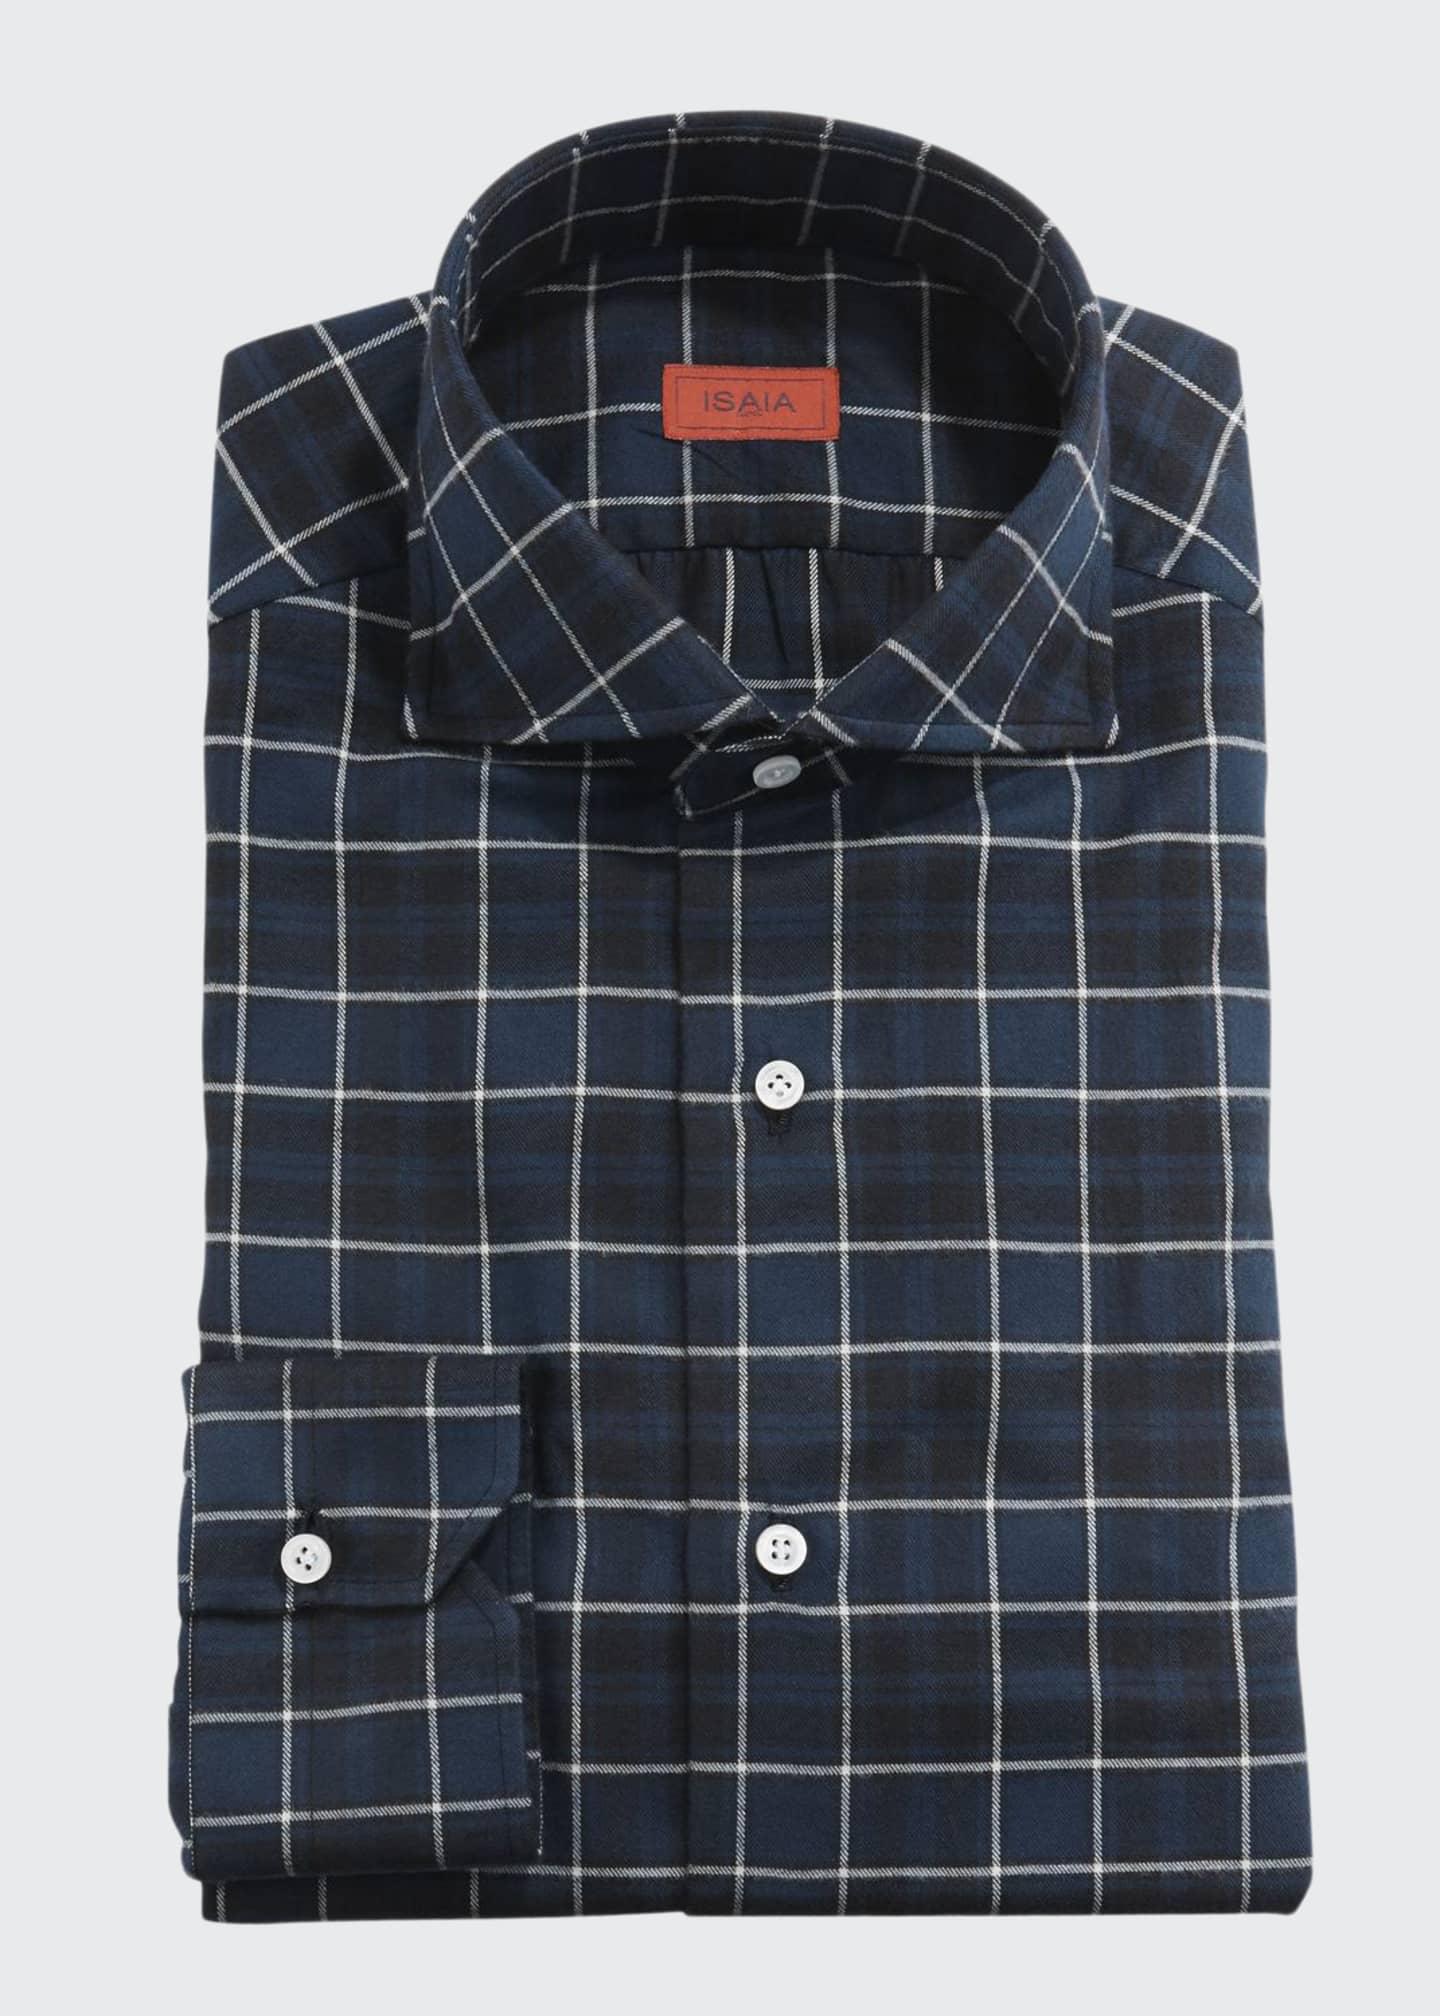 Isaia Men's Check Cotton Dress Shirt